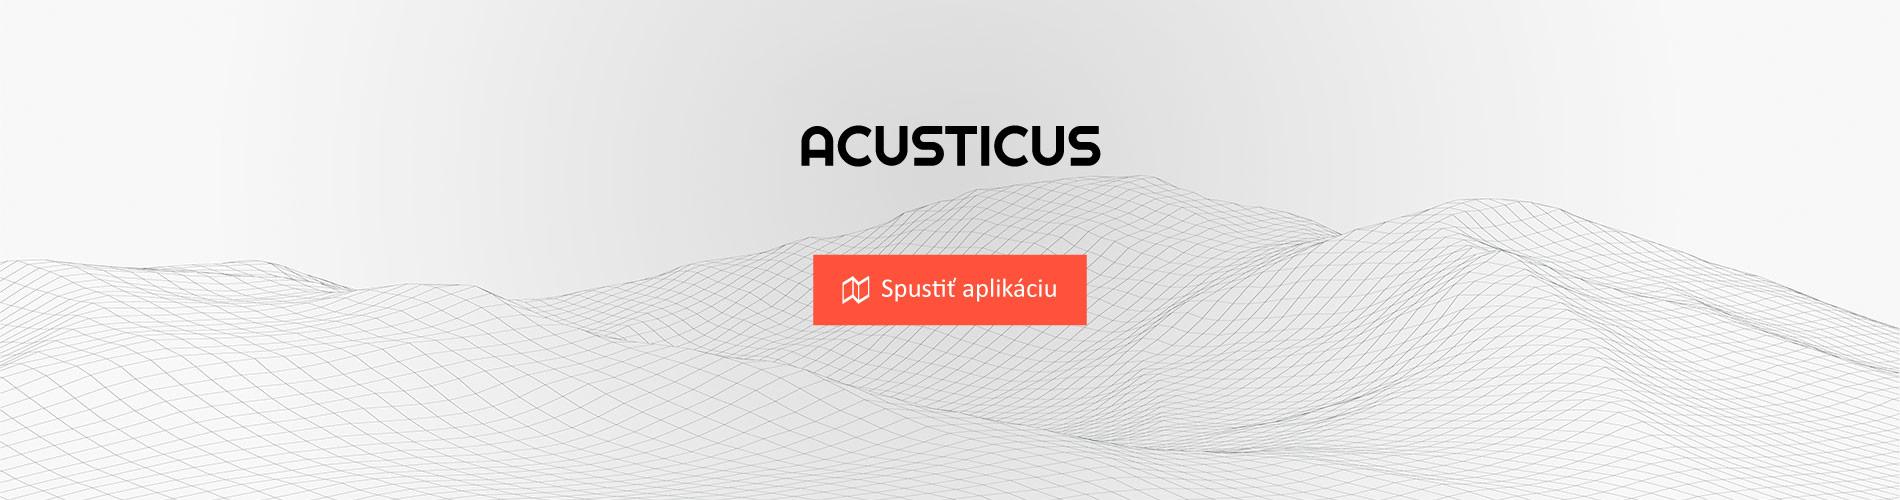 acusticus_button